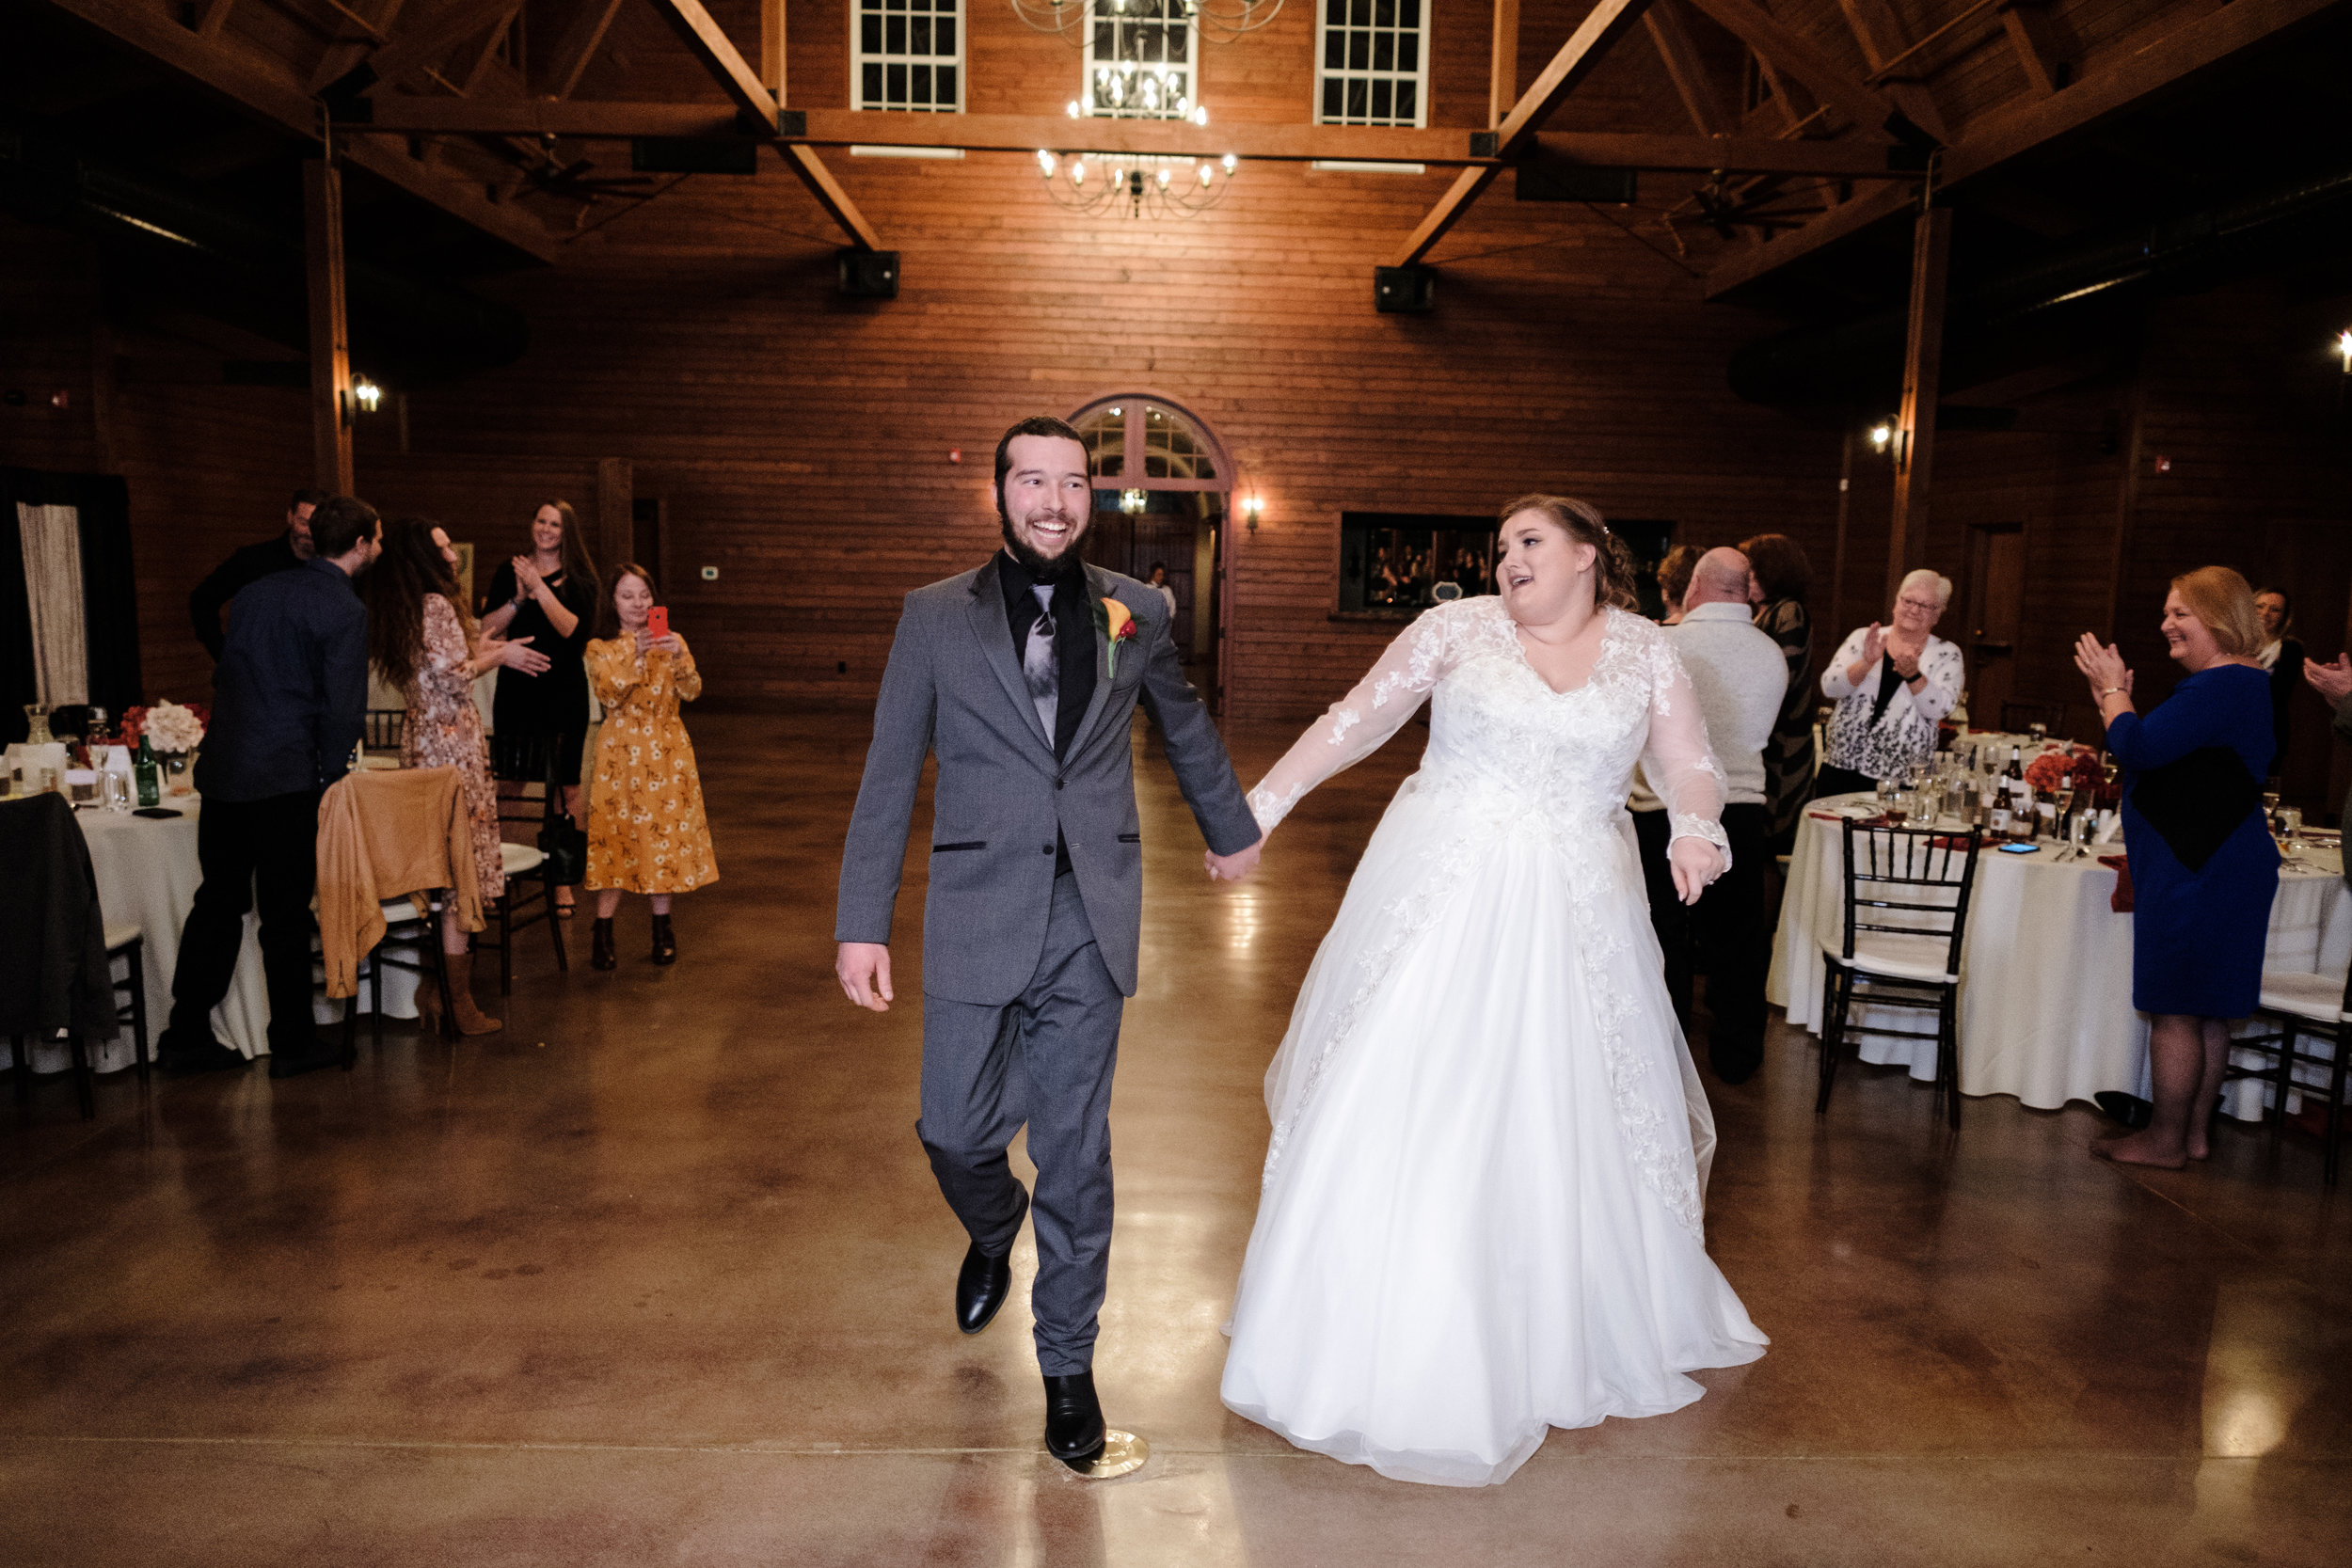 18-12-28 Corinne-Henry-Pavilion-Wedding-445.jpg